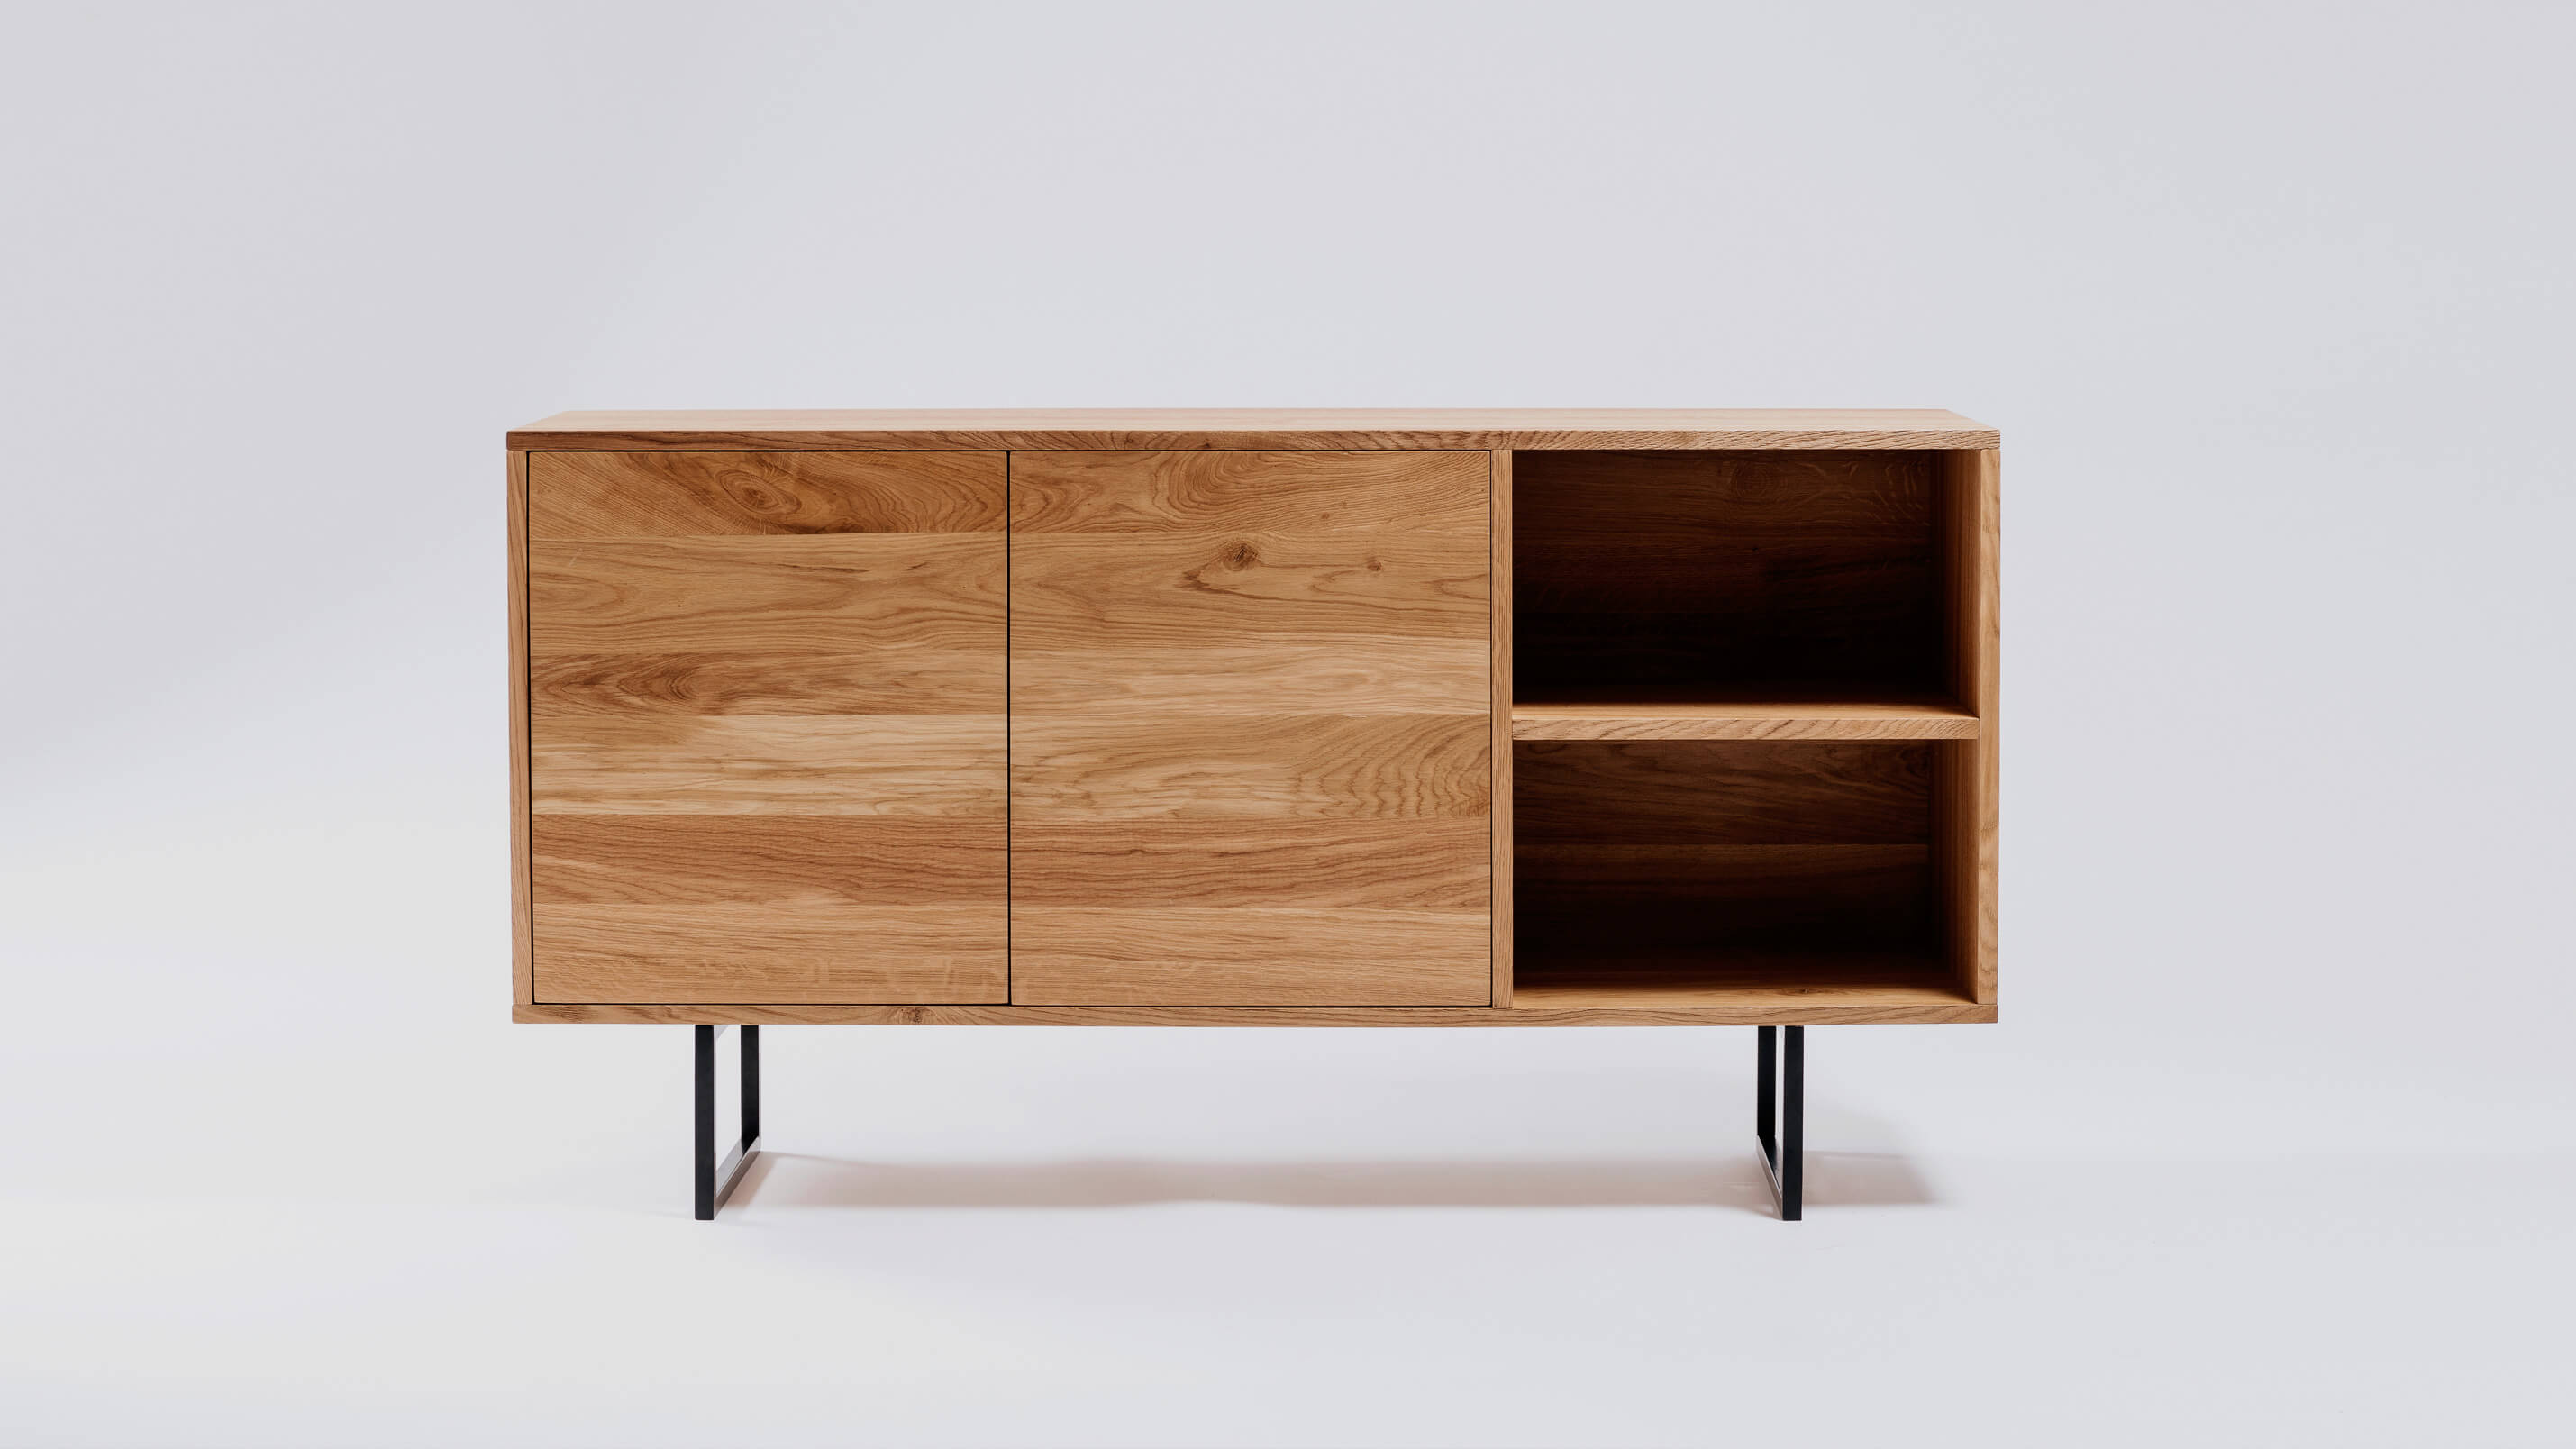 Muebles a medida muebles de dise o bois et fer - Muebles madera baratos ...